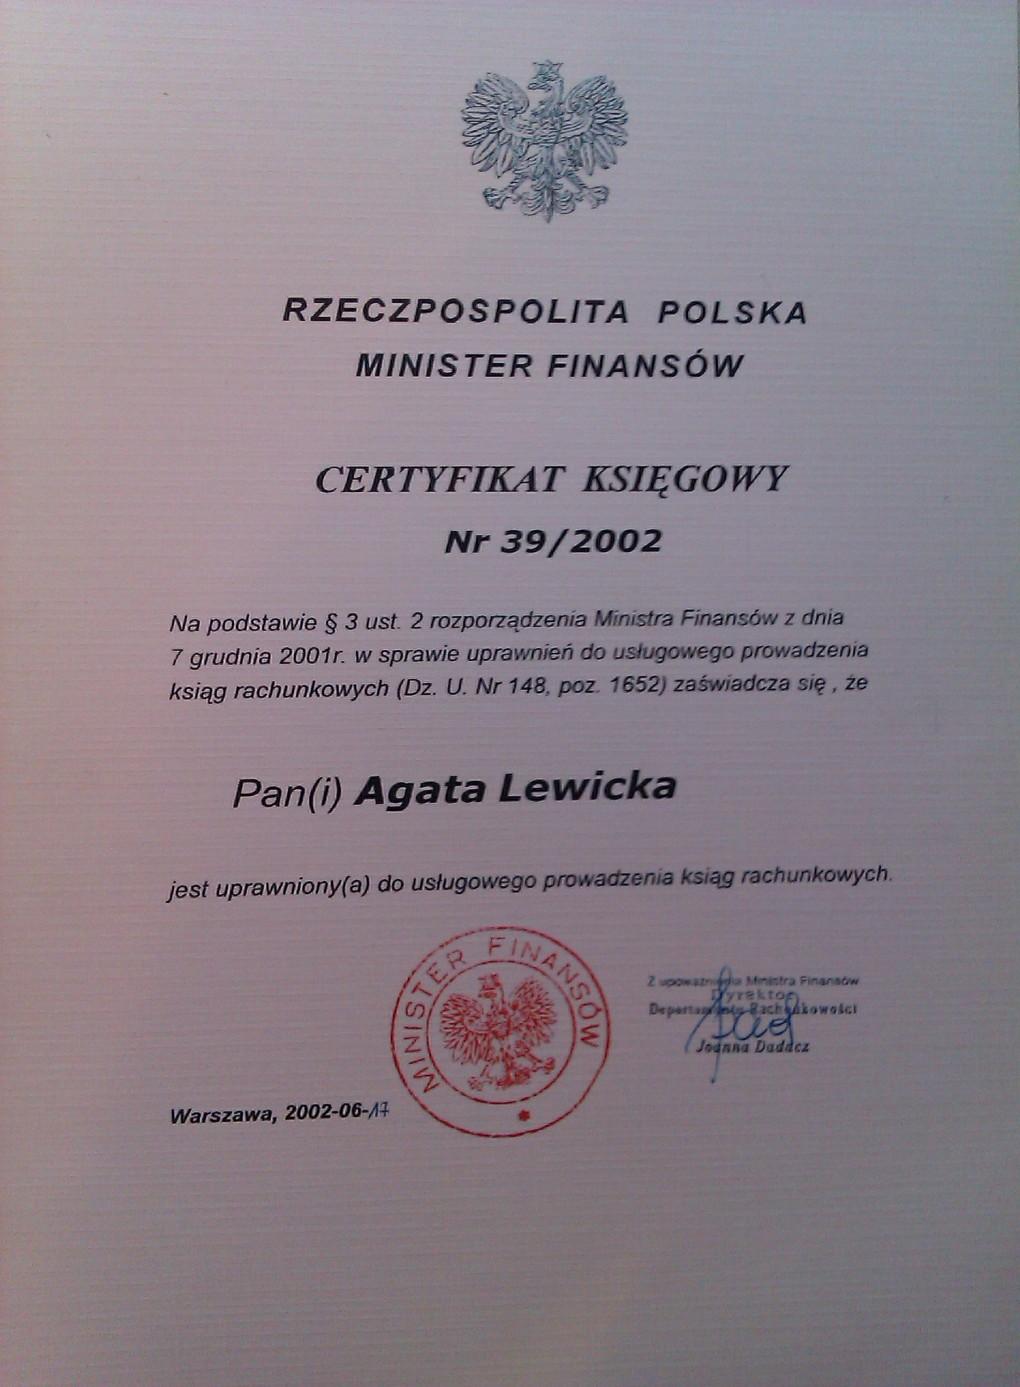 Agata Lewicka